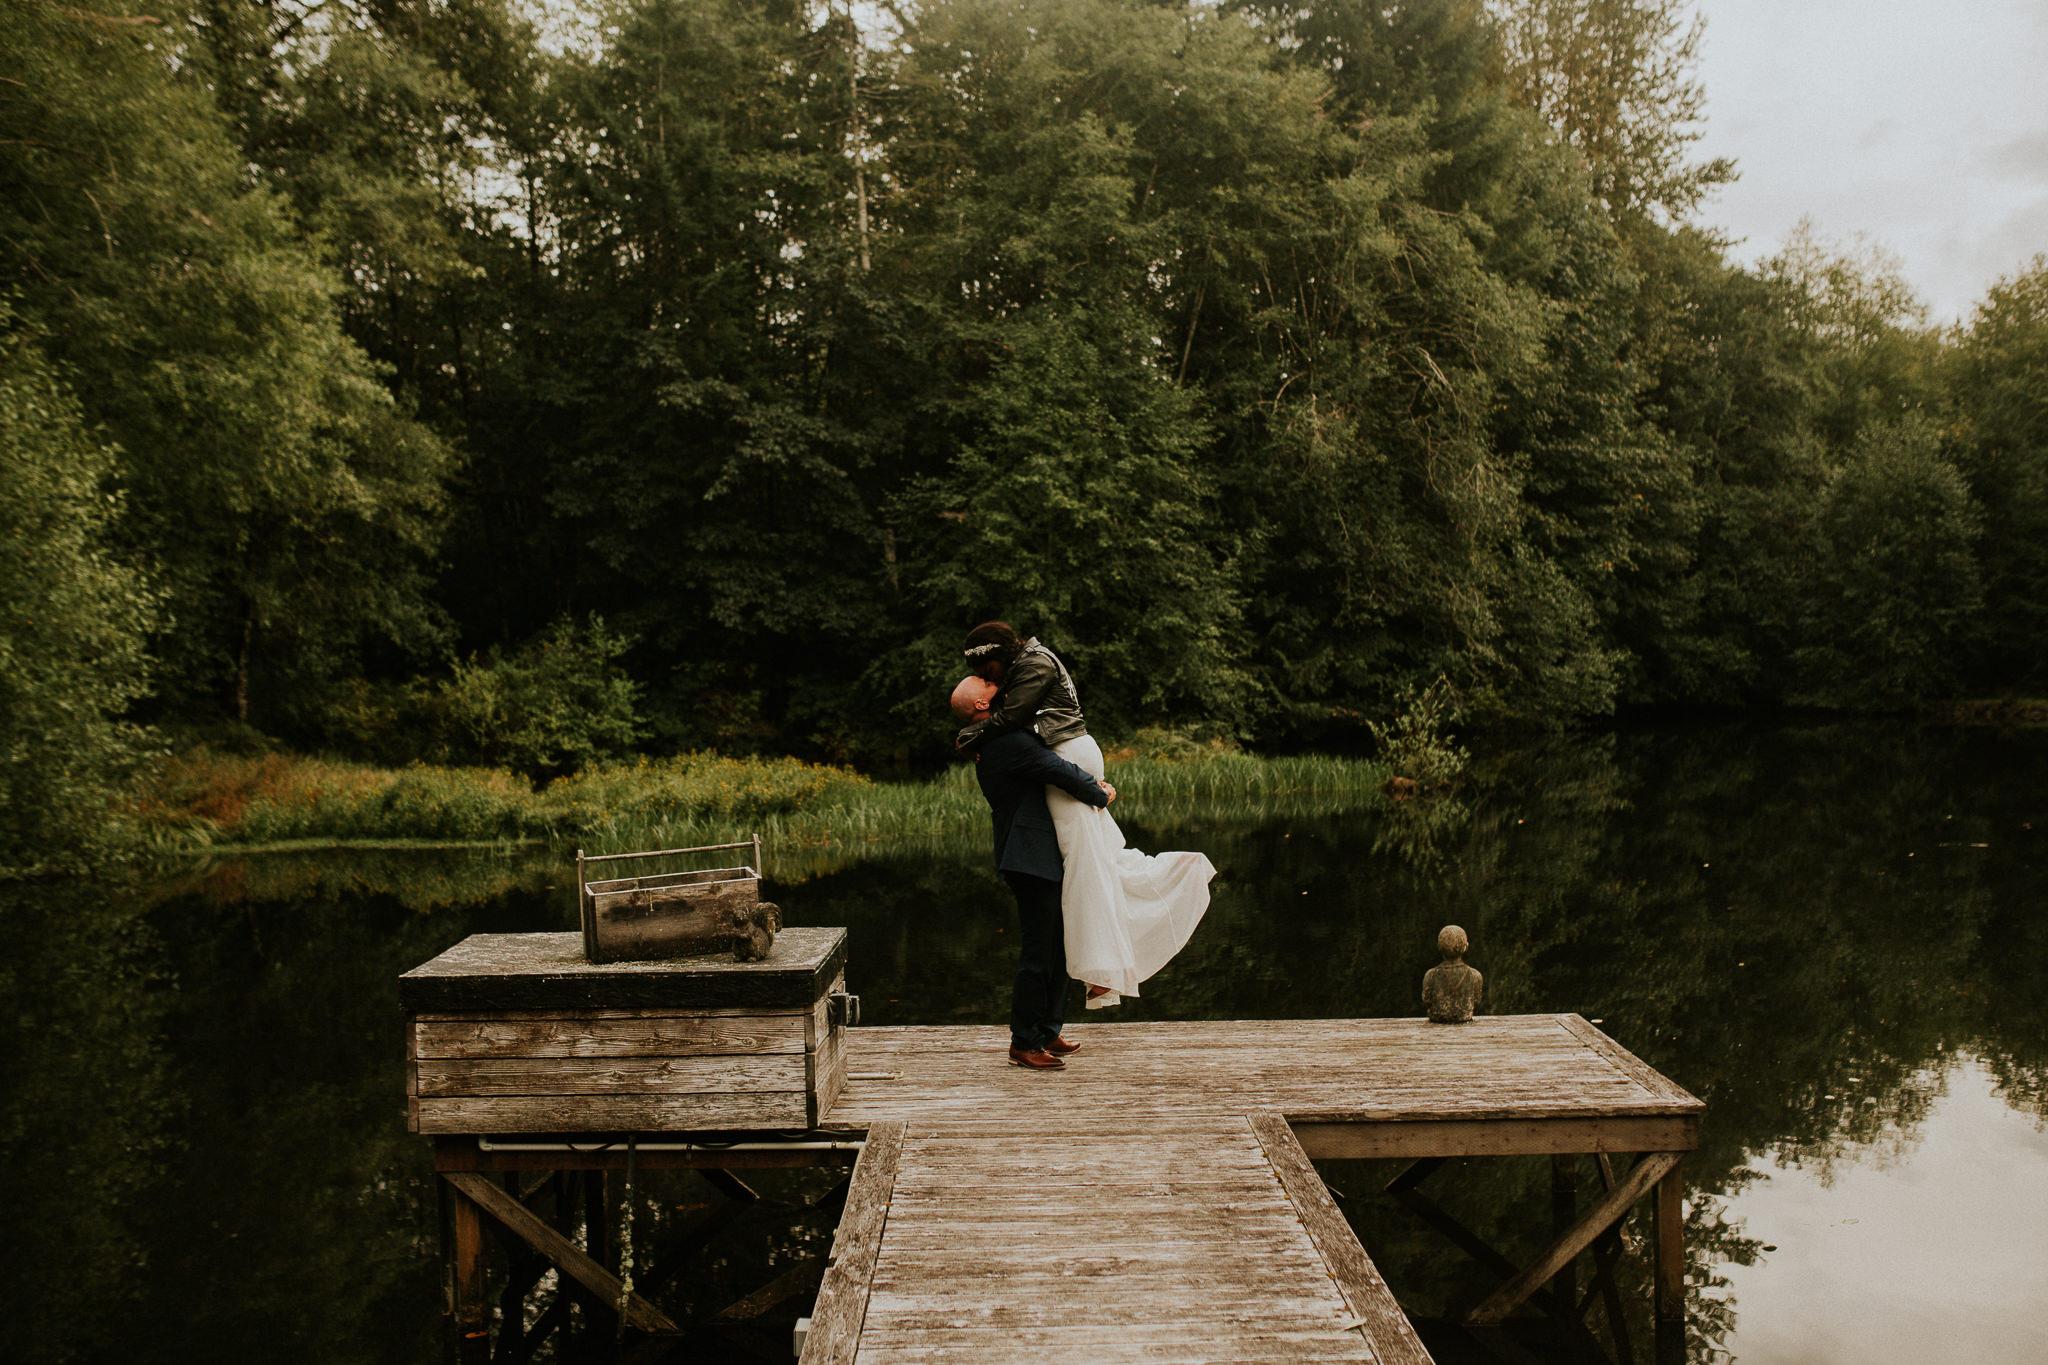 Lakeside-elopement-teasers-33.jpg